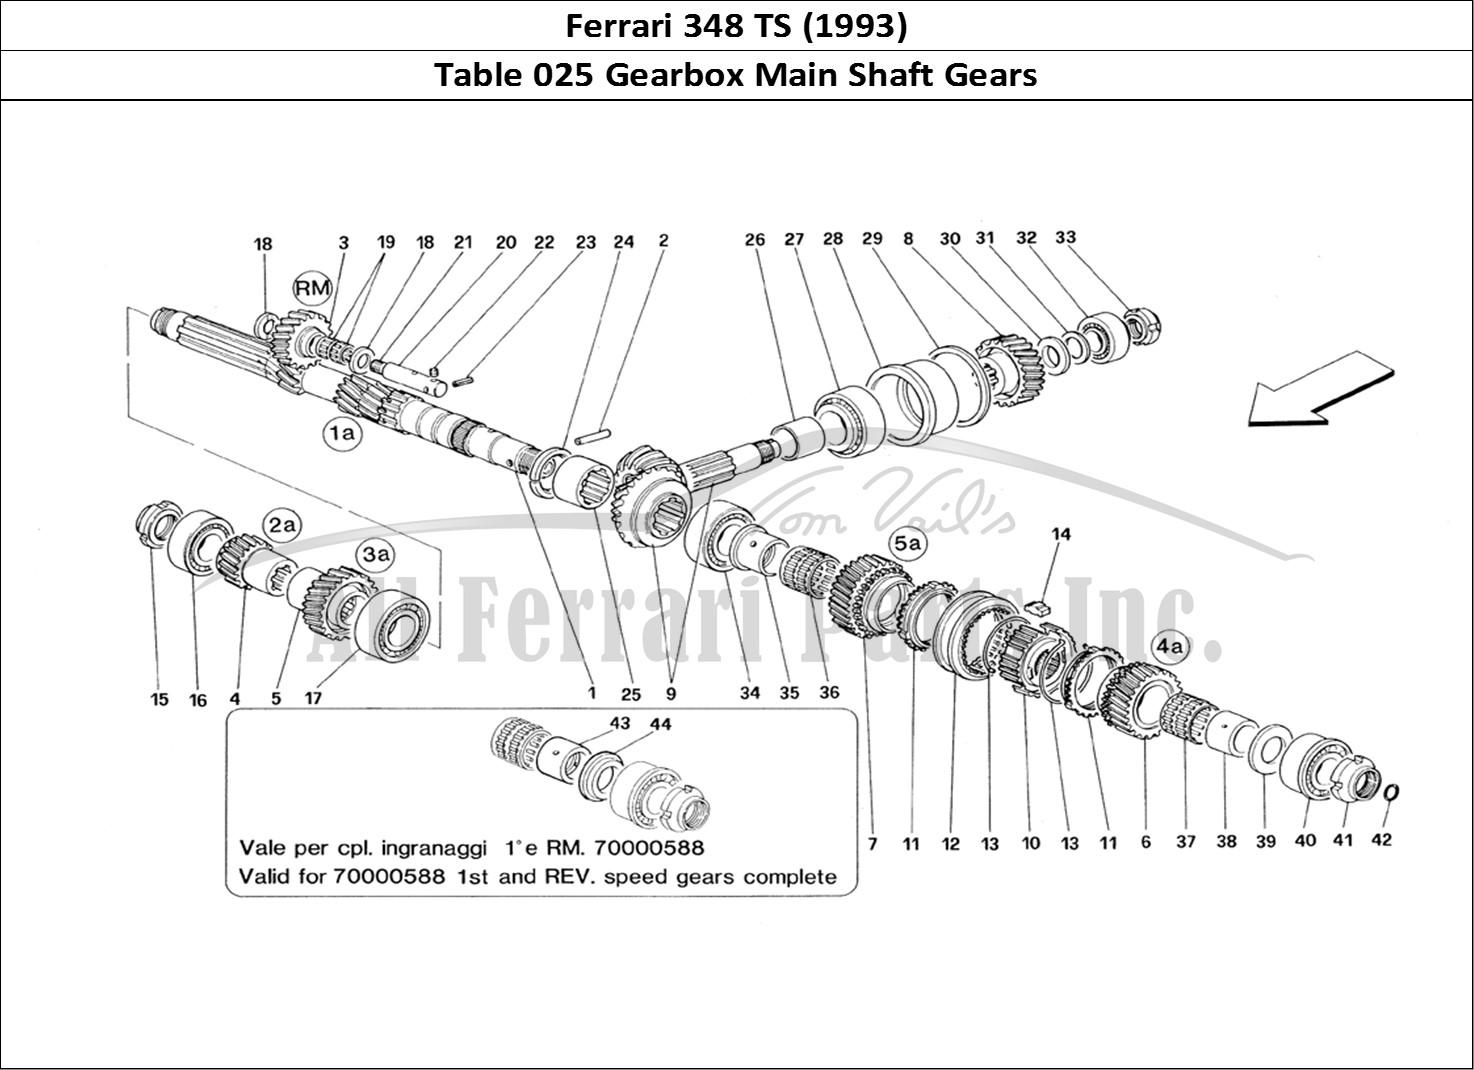 g56 diagram main shaft buy original ferrari 348 ts (1993) 025 gearbox main shaft ...